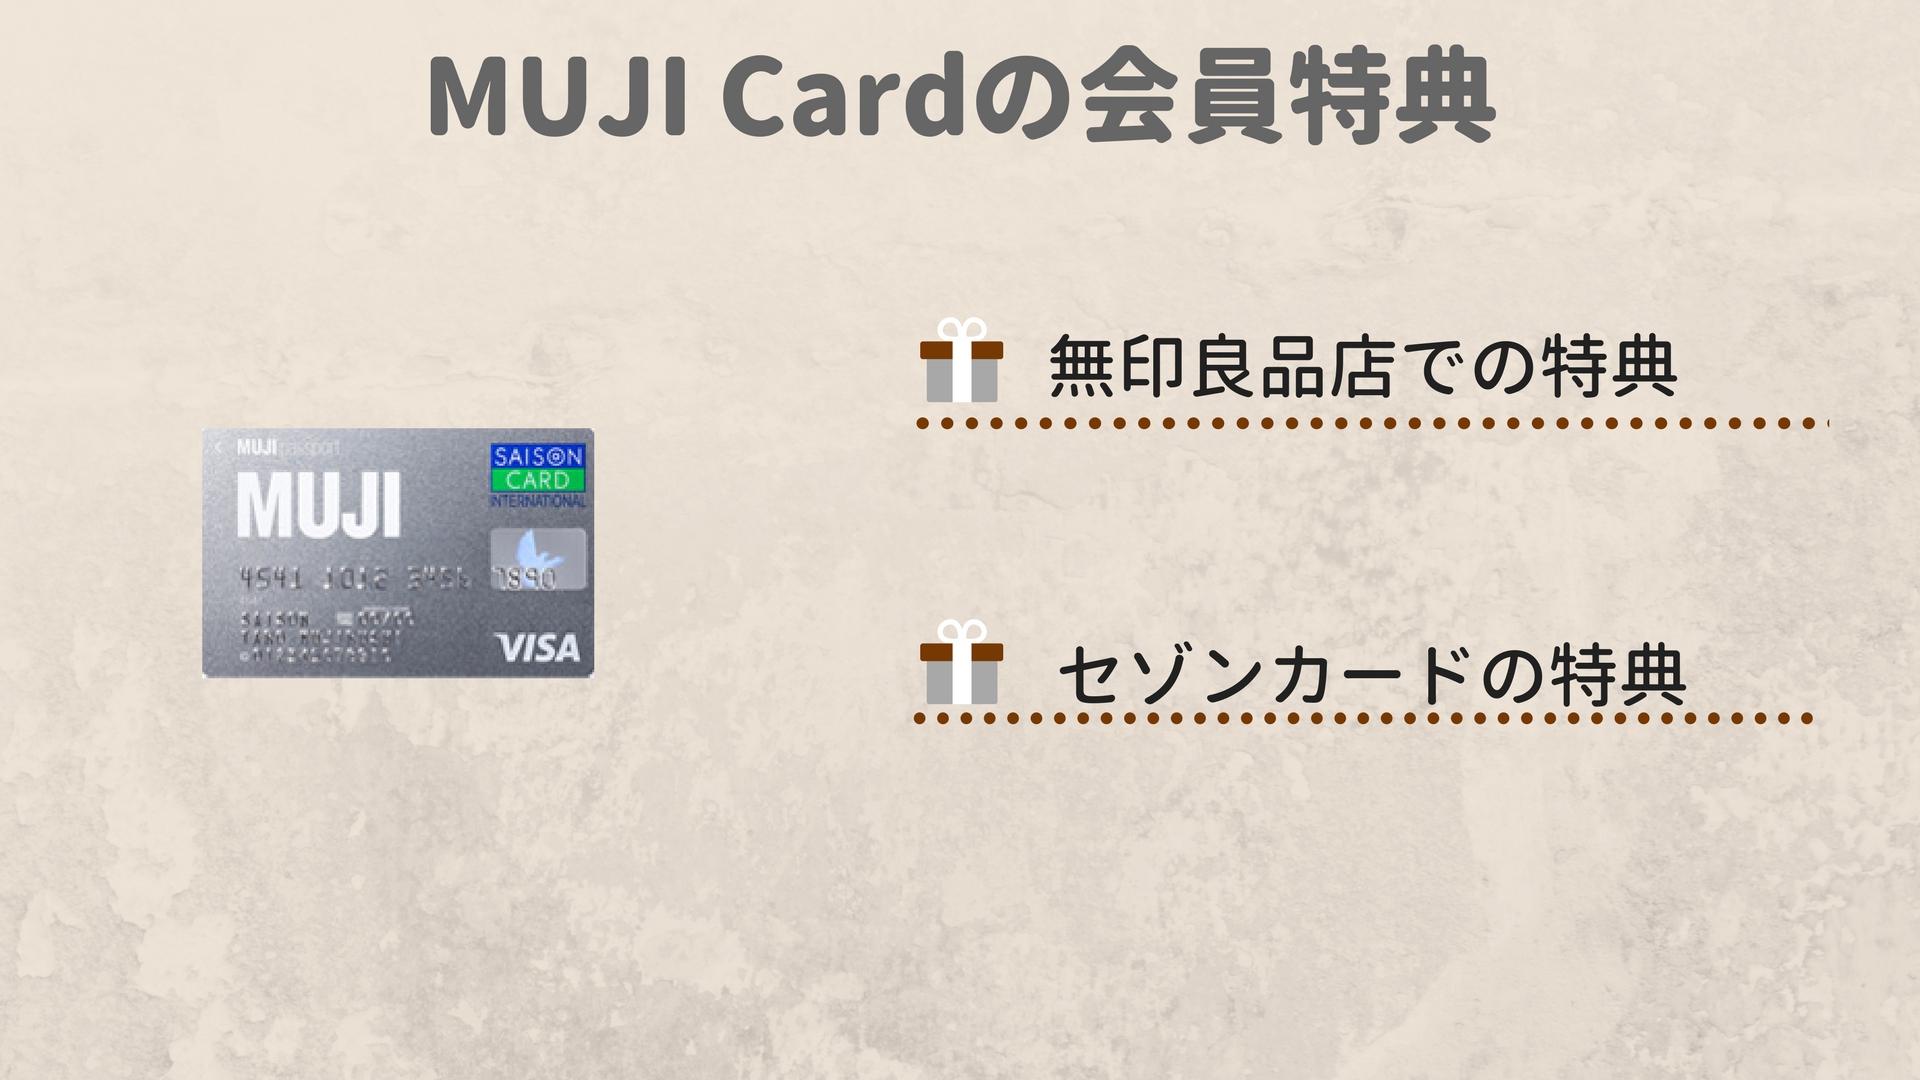 MUJI Cardの会員特典